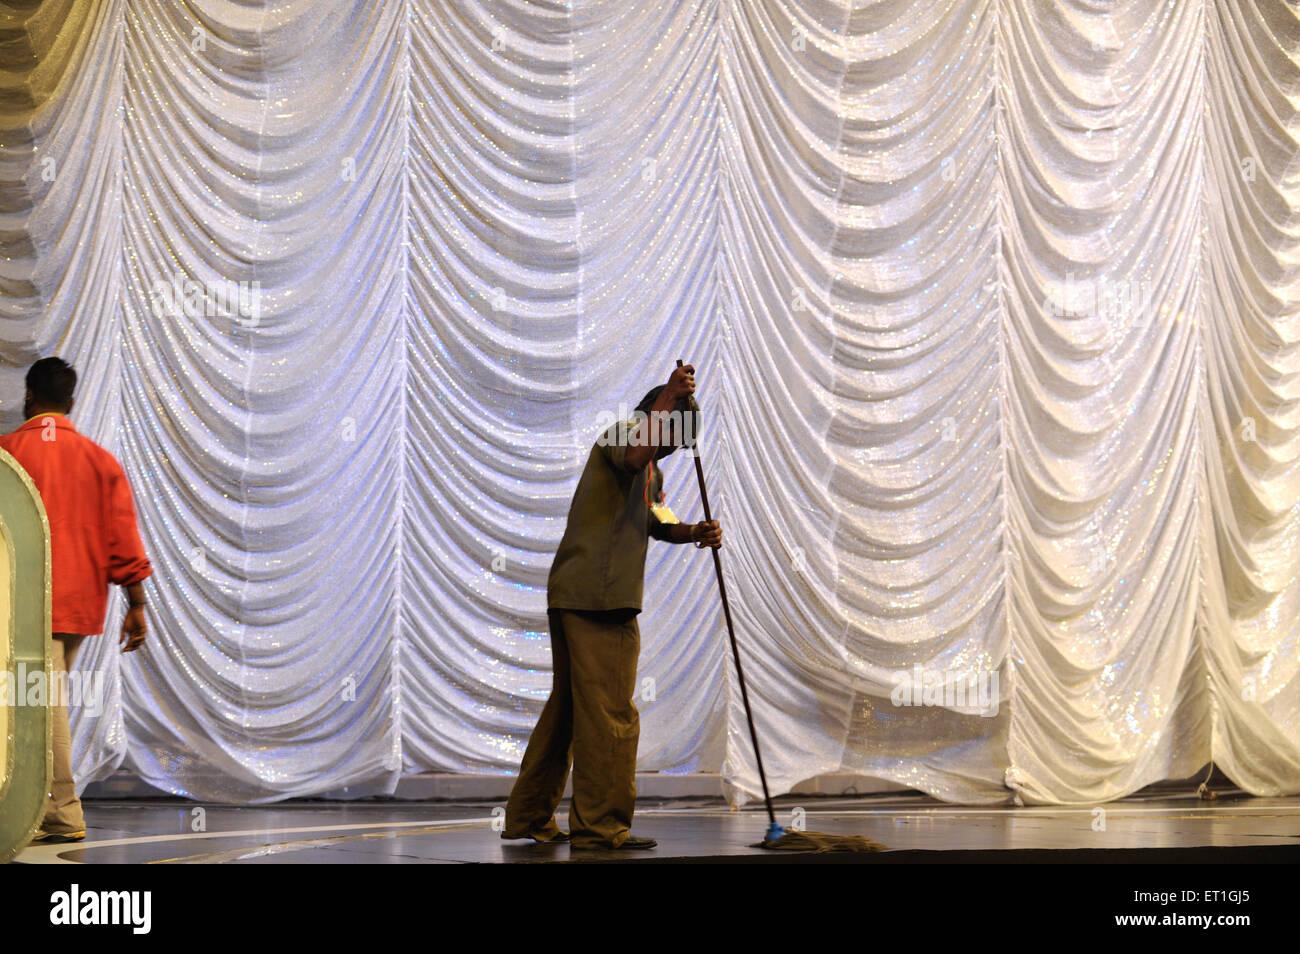 Préparation pour filmfare awards; Bombay Mumbai Maharashtra Inde; 2009; Photo Stock